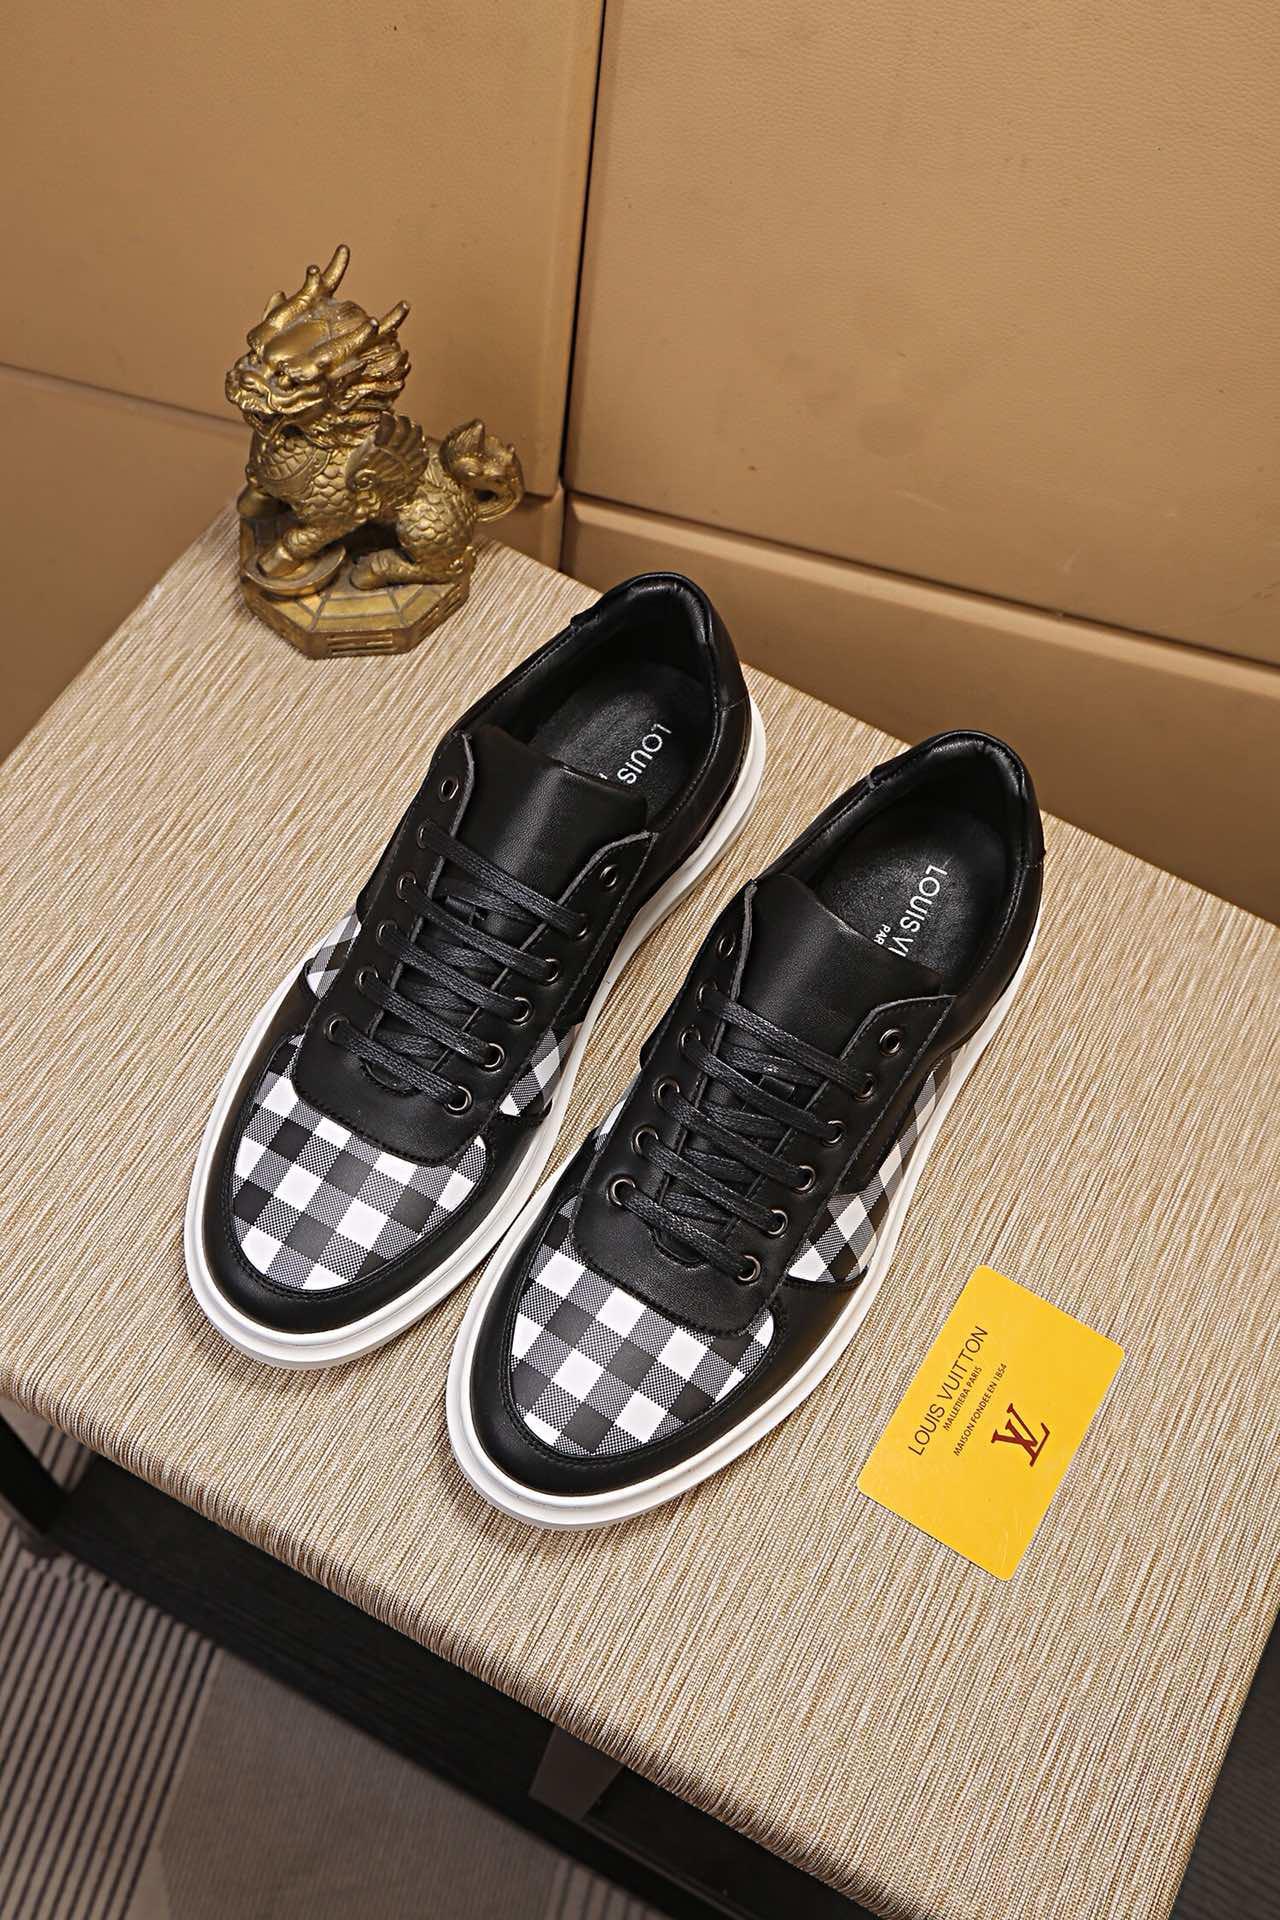 Louis Vuitton ルイヴィトン 靴 メンズ n級品入手 偽物